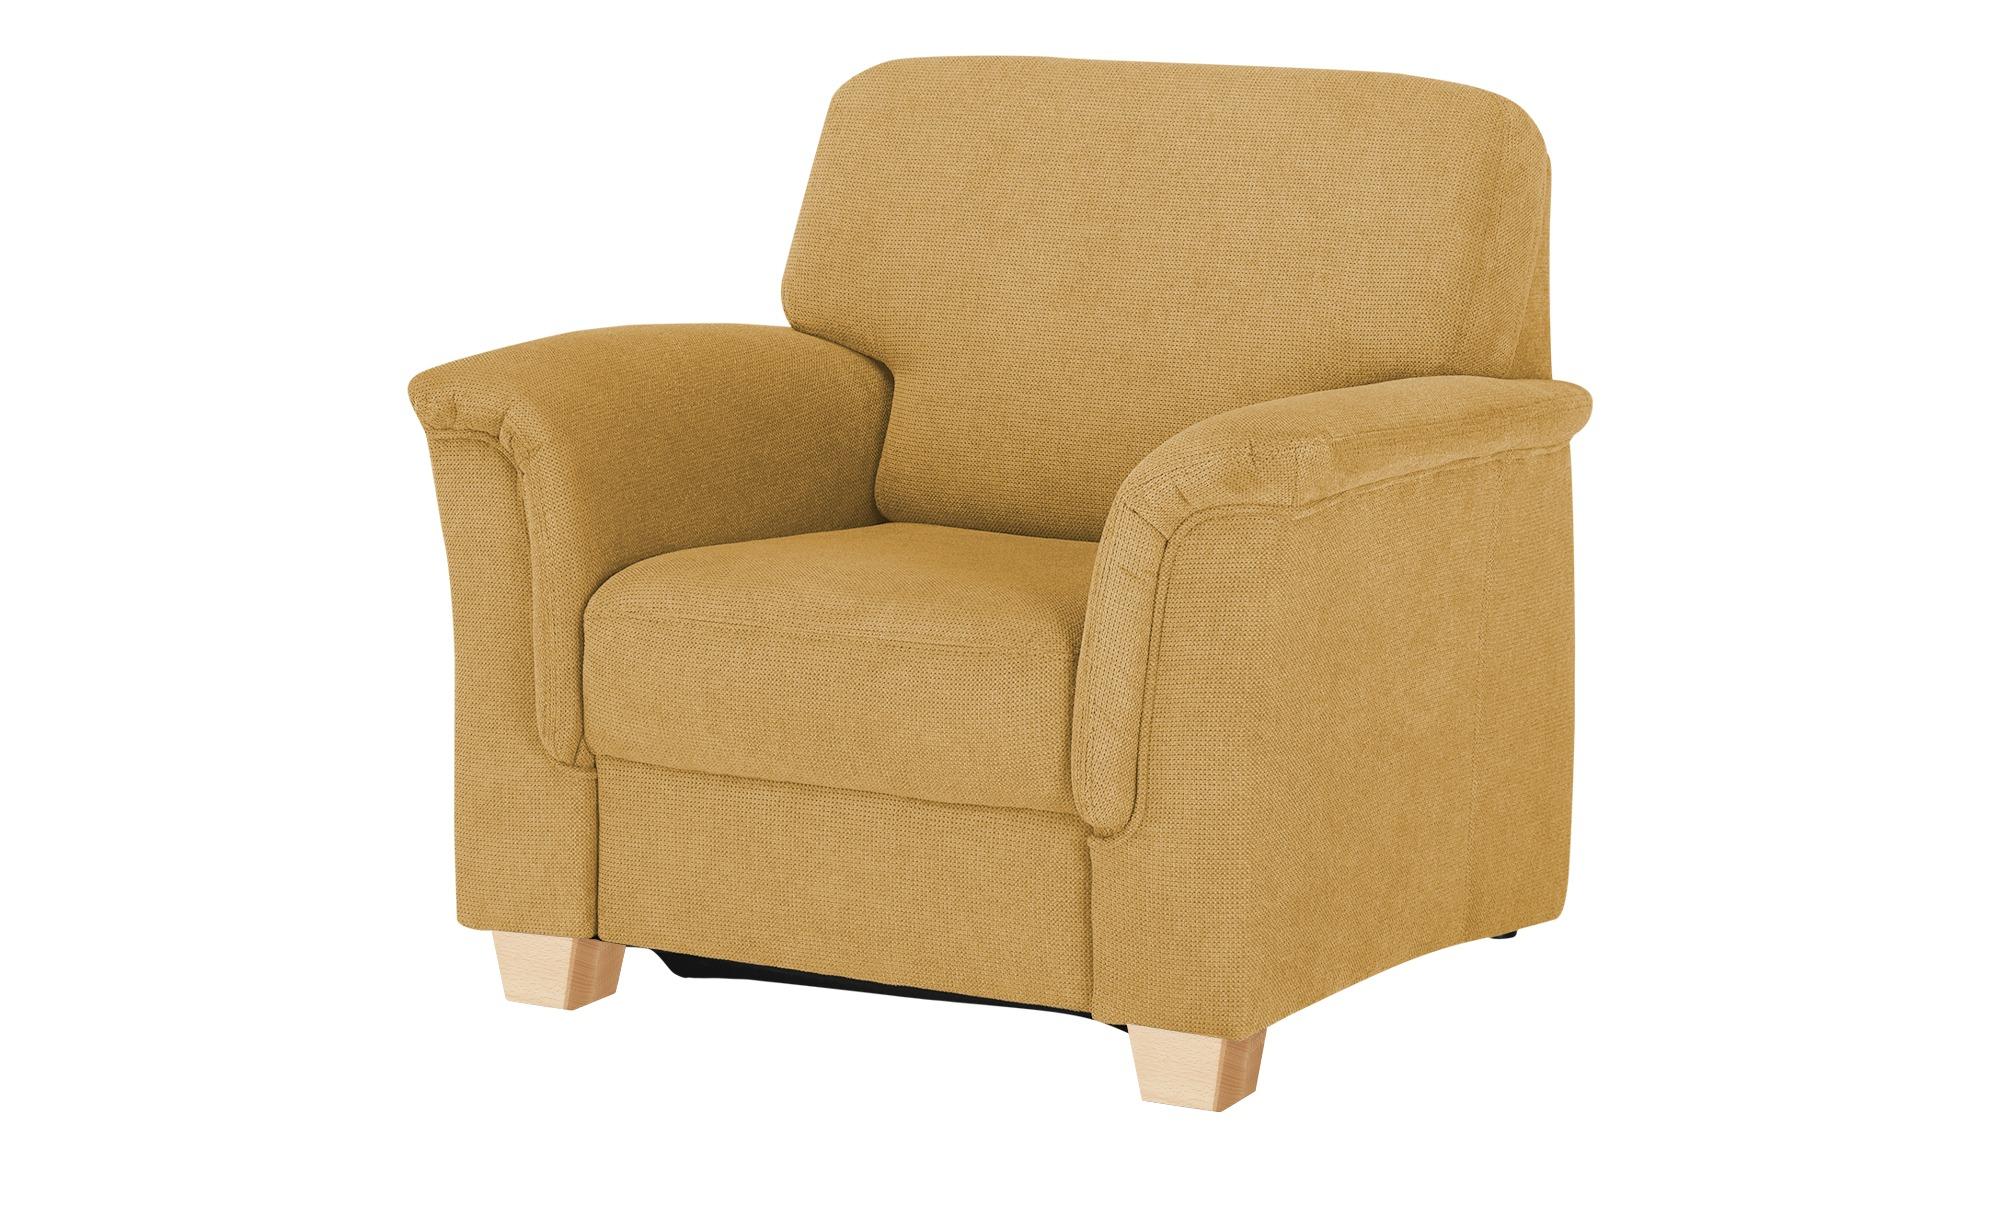 smart Sessel  Valencia ¦ gelb ¦ Maße (cm): B: 100 H: 90 T: 93 Polstermöbel > Sessel > Polstersessel - Höffner